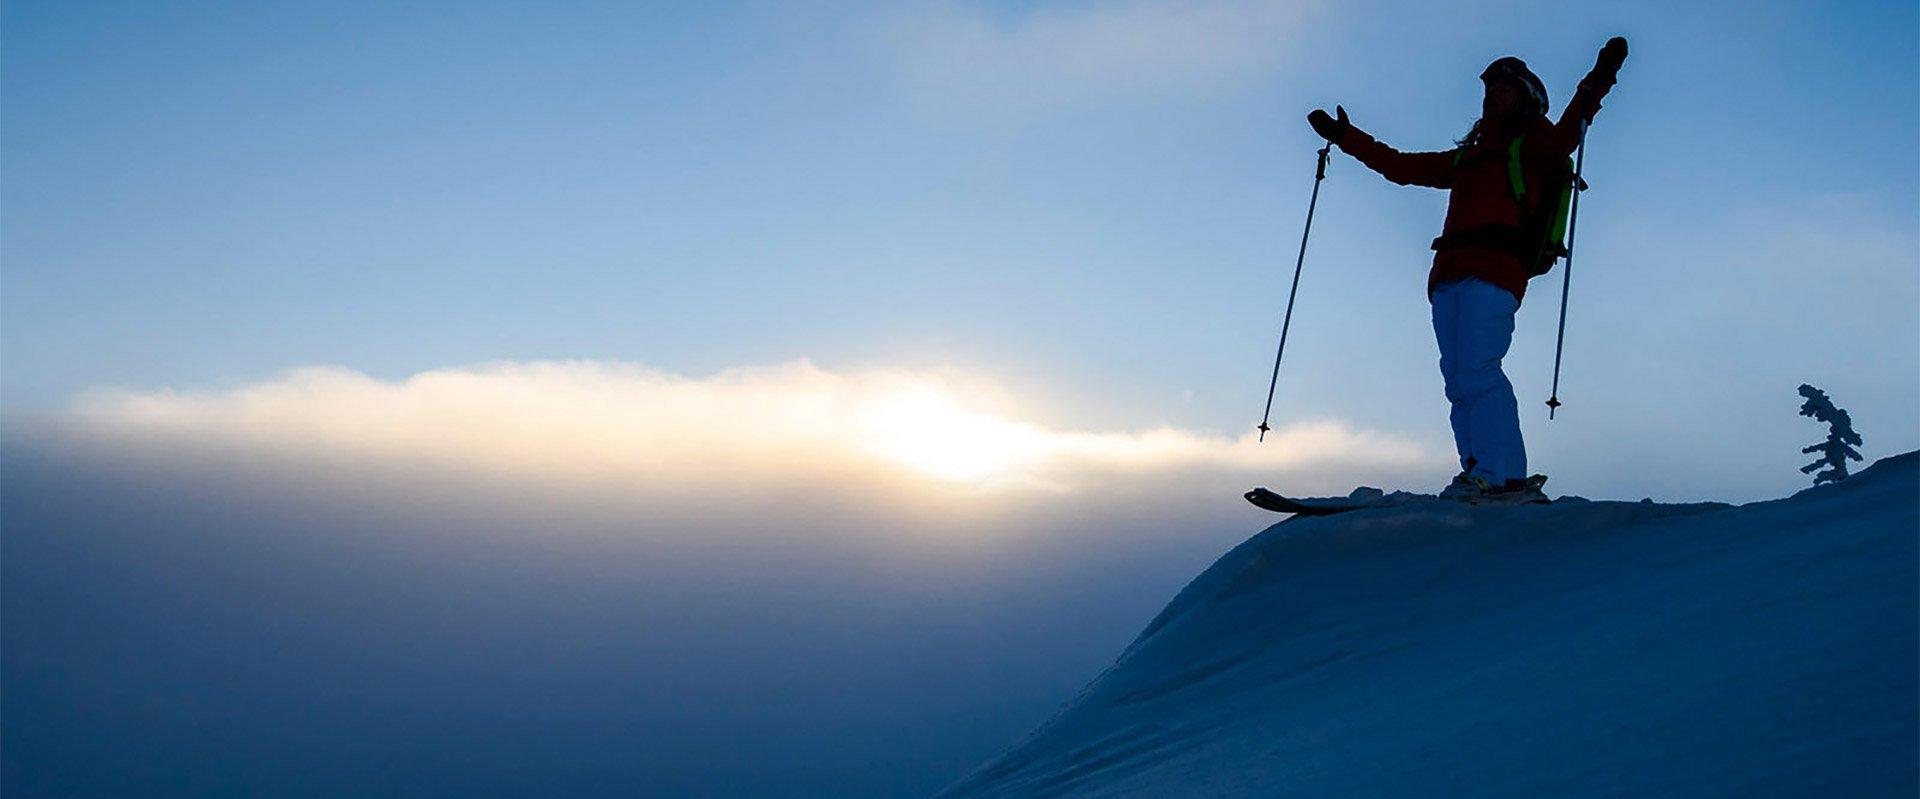 vimff 2019 protect our winters ski show title bg